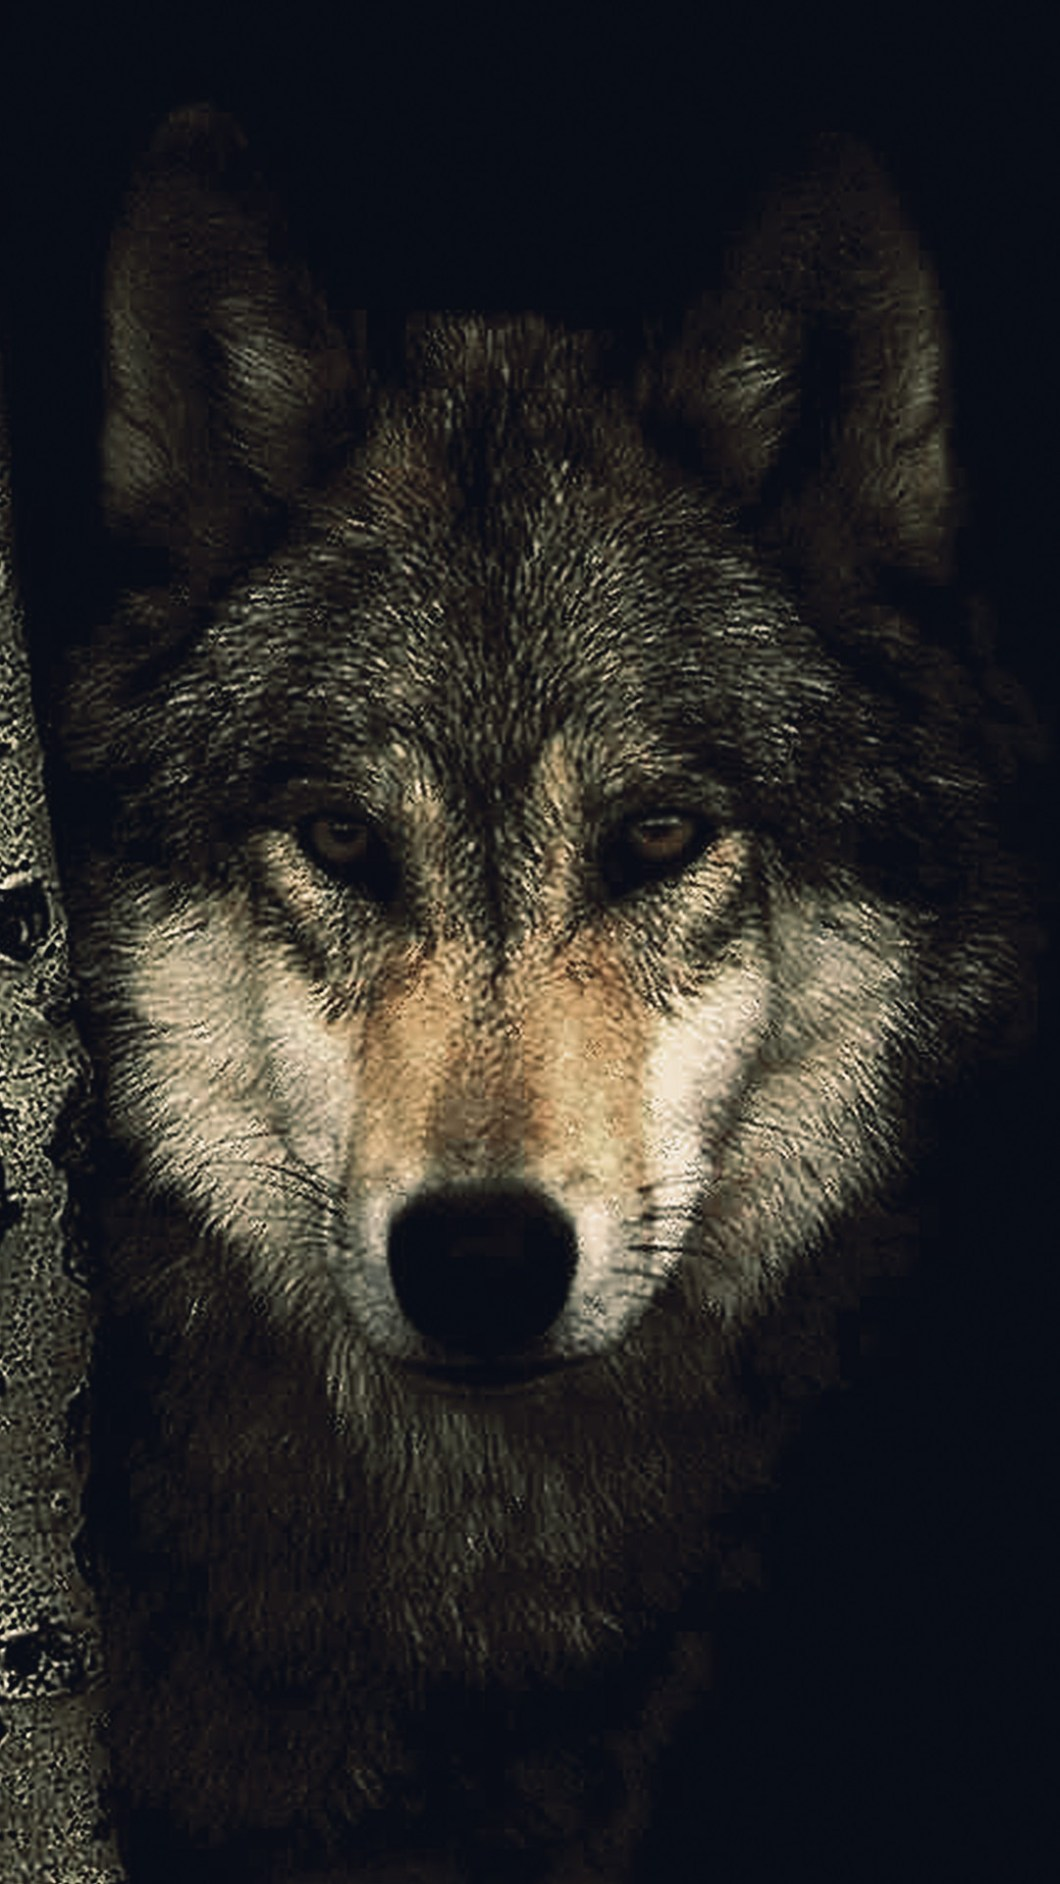 Wolf Wallpaper 4k Iphone Bestpicture1 Org